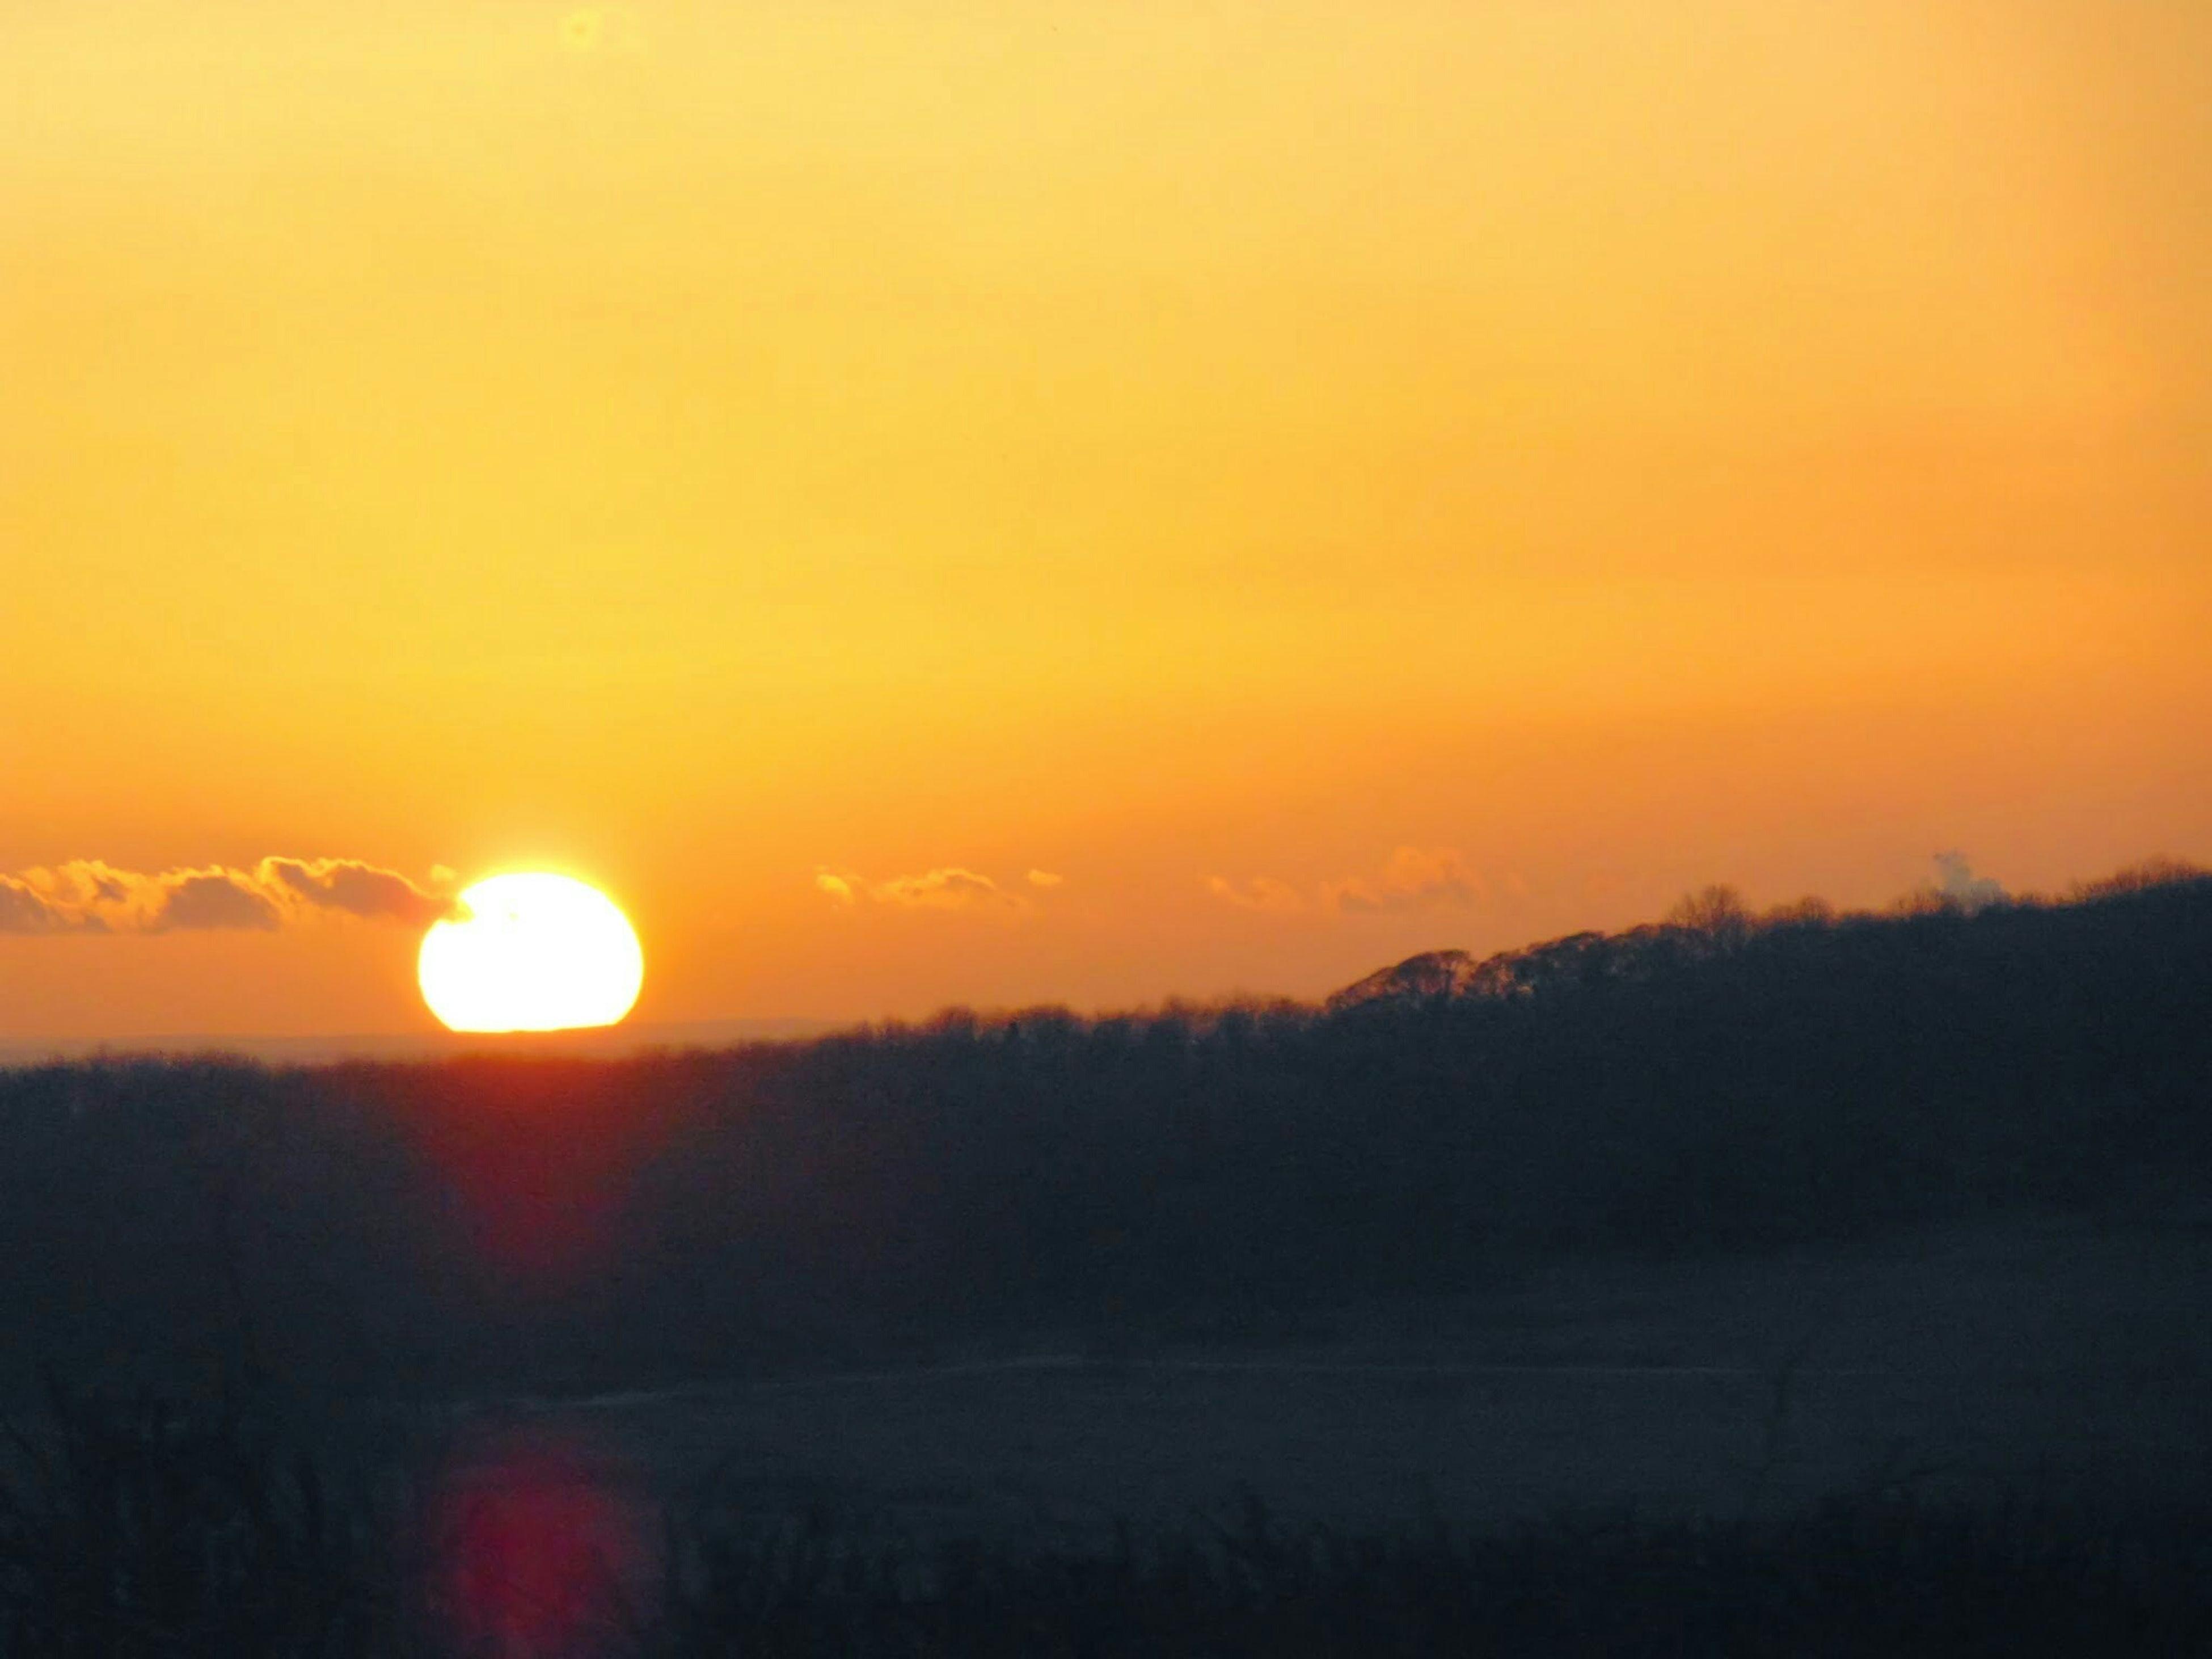 sunset, orange color, sun, tranquil scene, scenics, beauty in nature, tranquility, silhouette, landscape, idyllic, nature, sky, copy space, non-urban scene, sunlight, outdoors, field, clear sky, majestic, no people